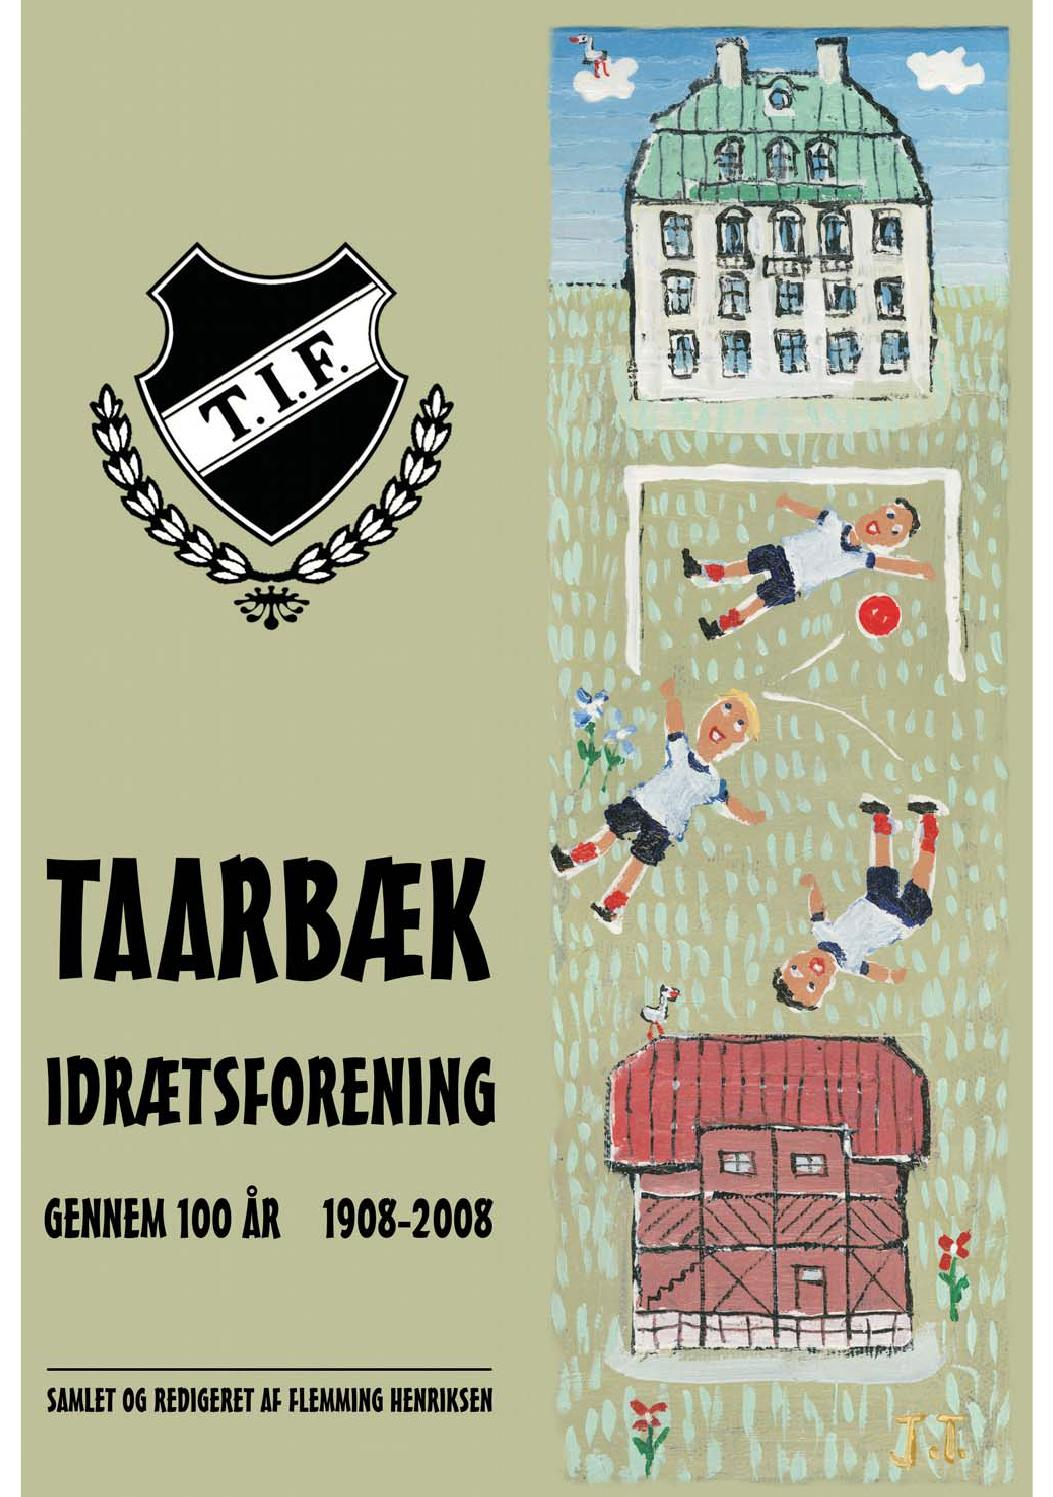 4ee23ed08a2 Taarbæk Idrætsforening gennem 100 år i 2015 by TaarbaekNyt - issuu